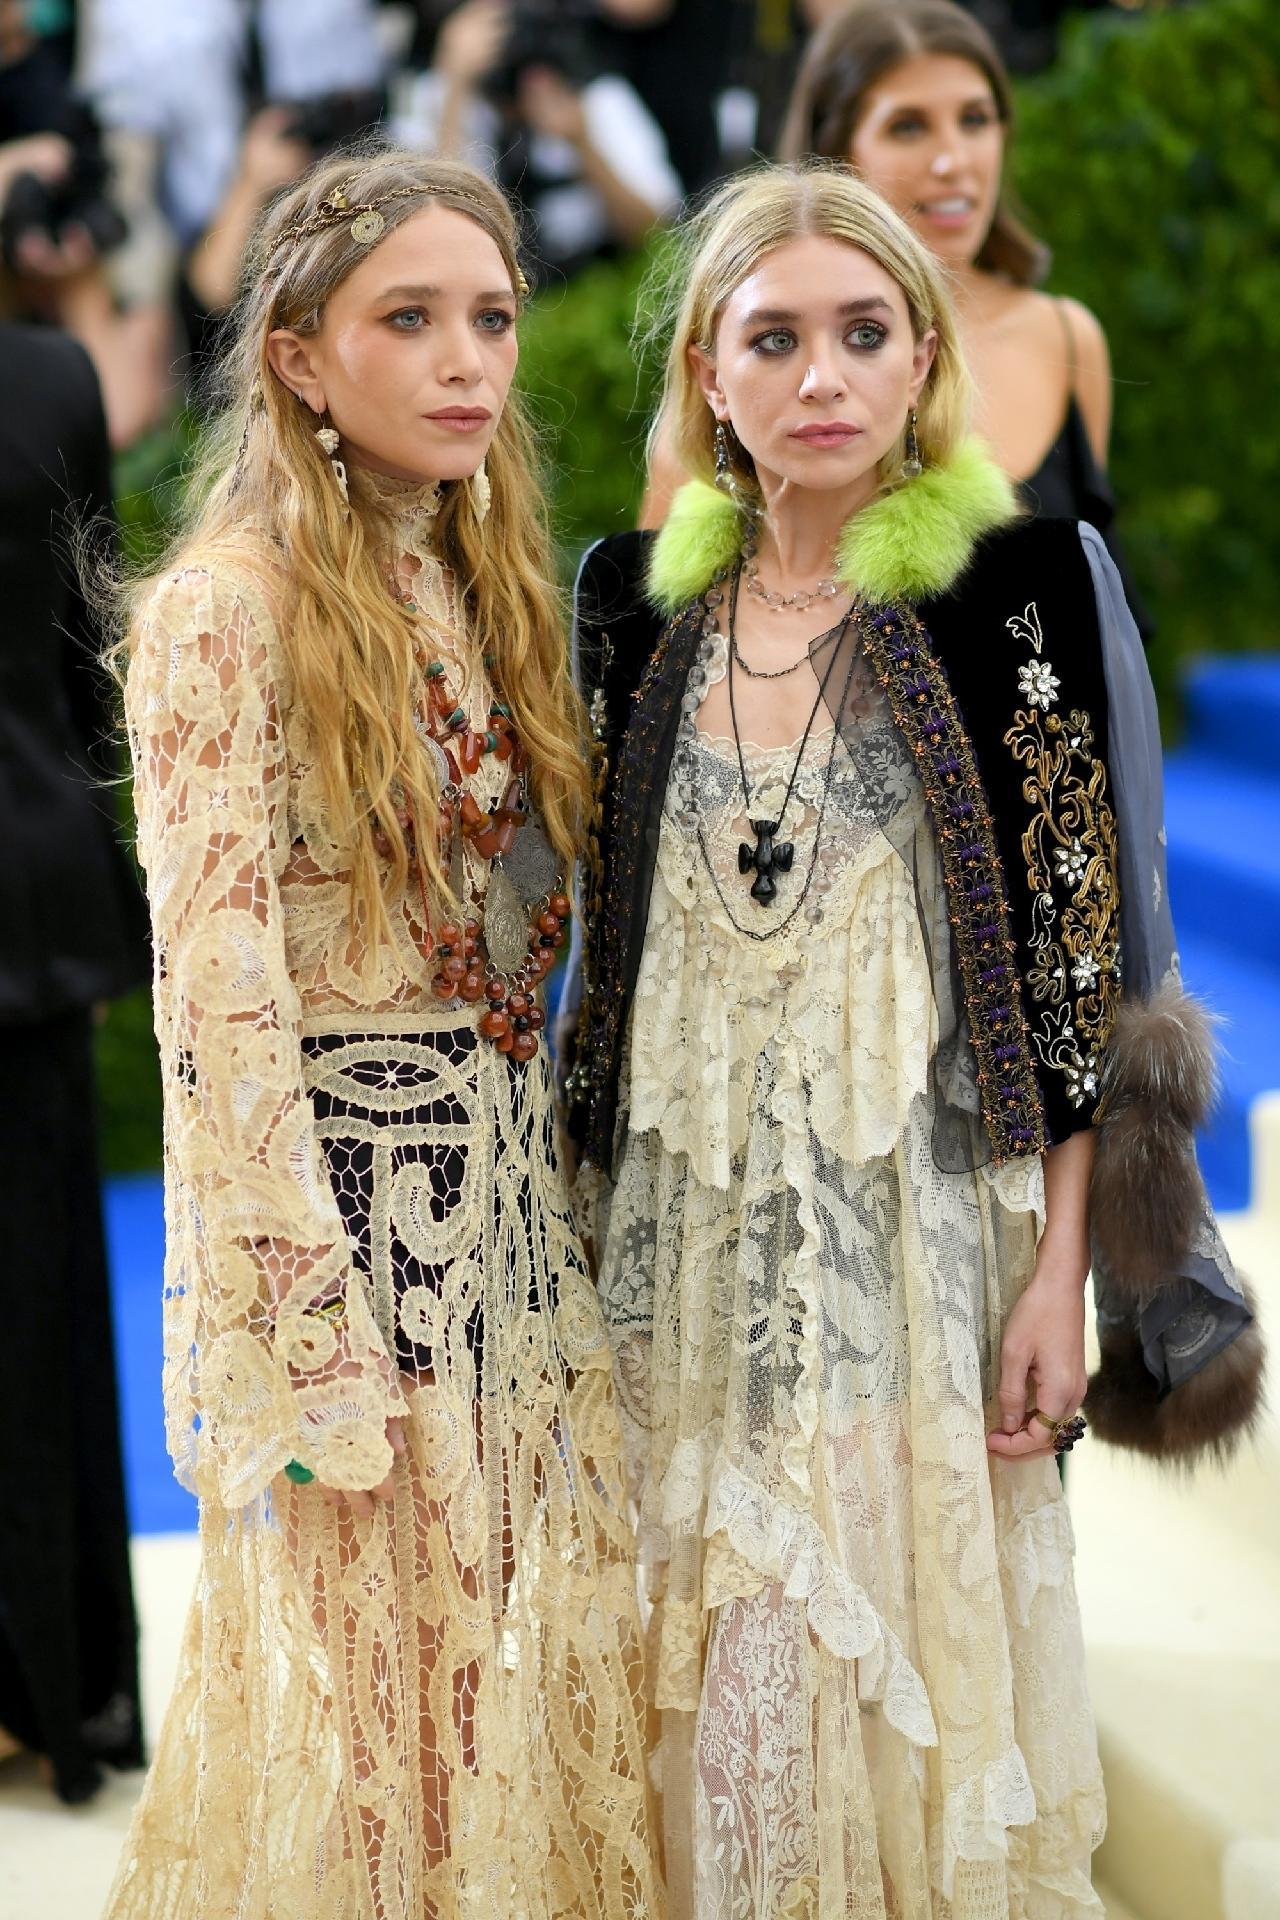 ashley e mary kate olsen irmãs famosas